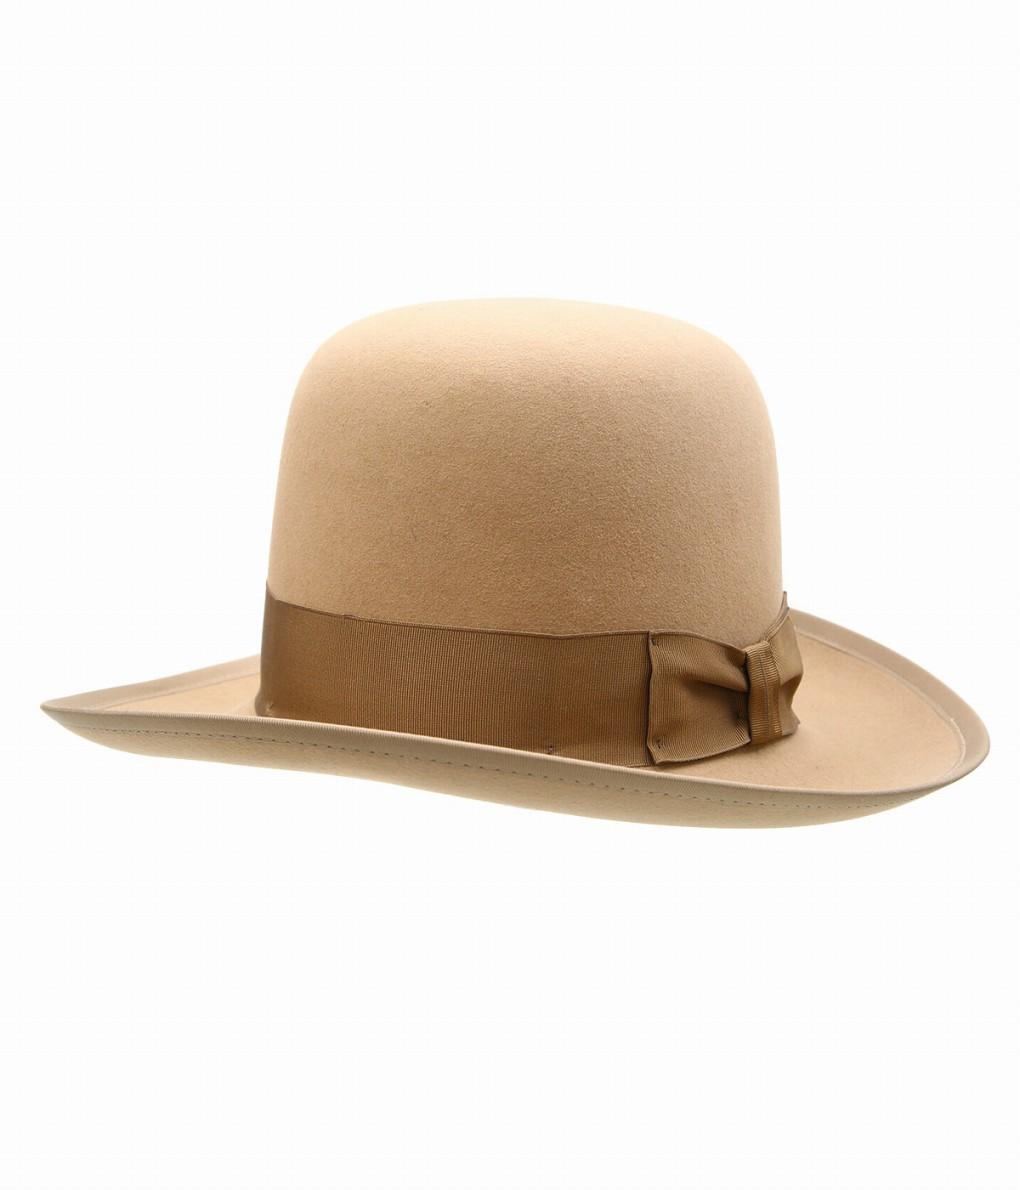 STETSON / ステットソン : STETSONIAN Repro / 全2色 : ステットソニアン レプロ HAT 帽子 ハット メンズ : ST204-19A00 【STD】